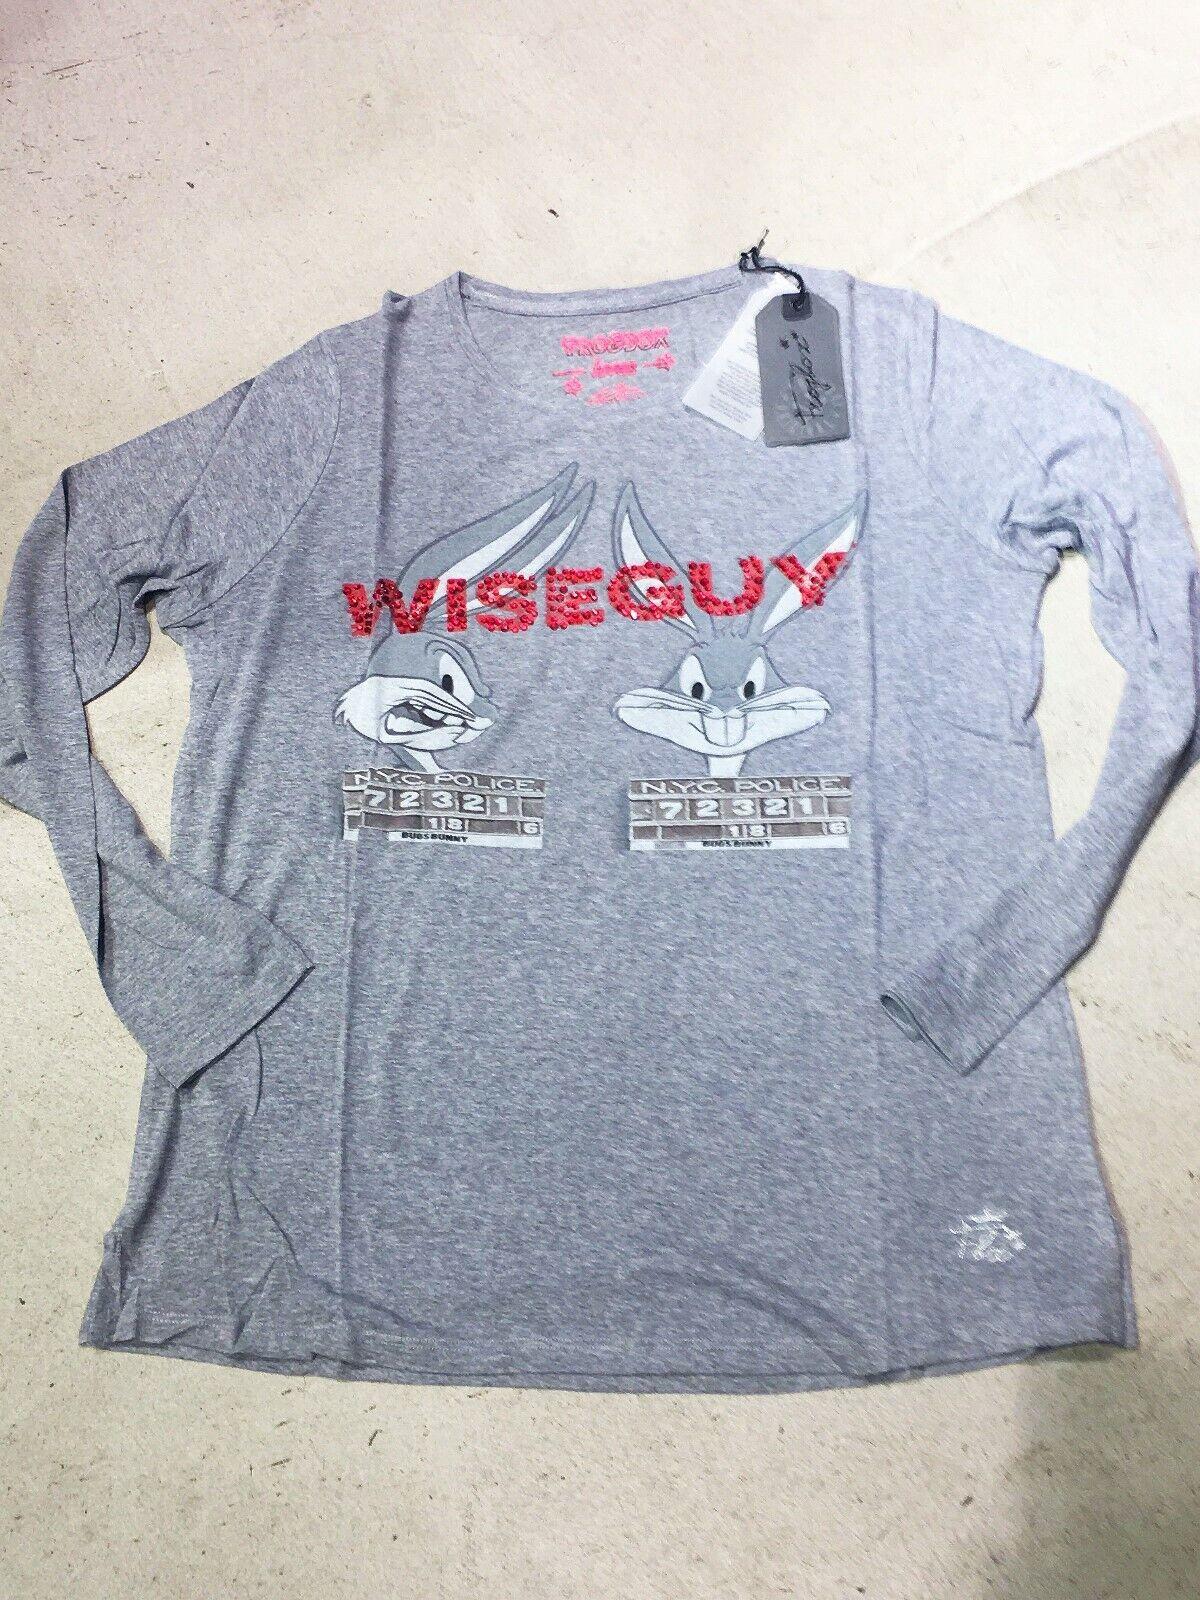 FROGBOX   PRINCESS  Shirt Bunny Wiseguy Strass  Grau Melange 40 42 44